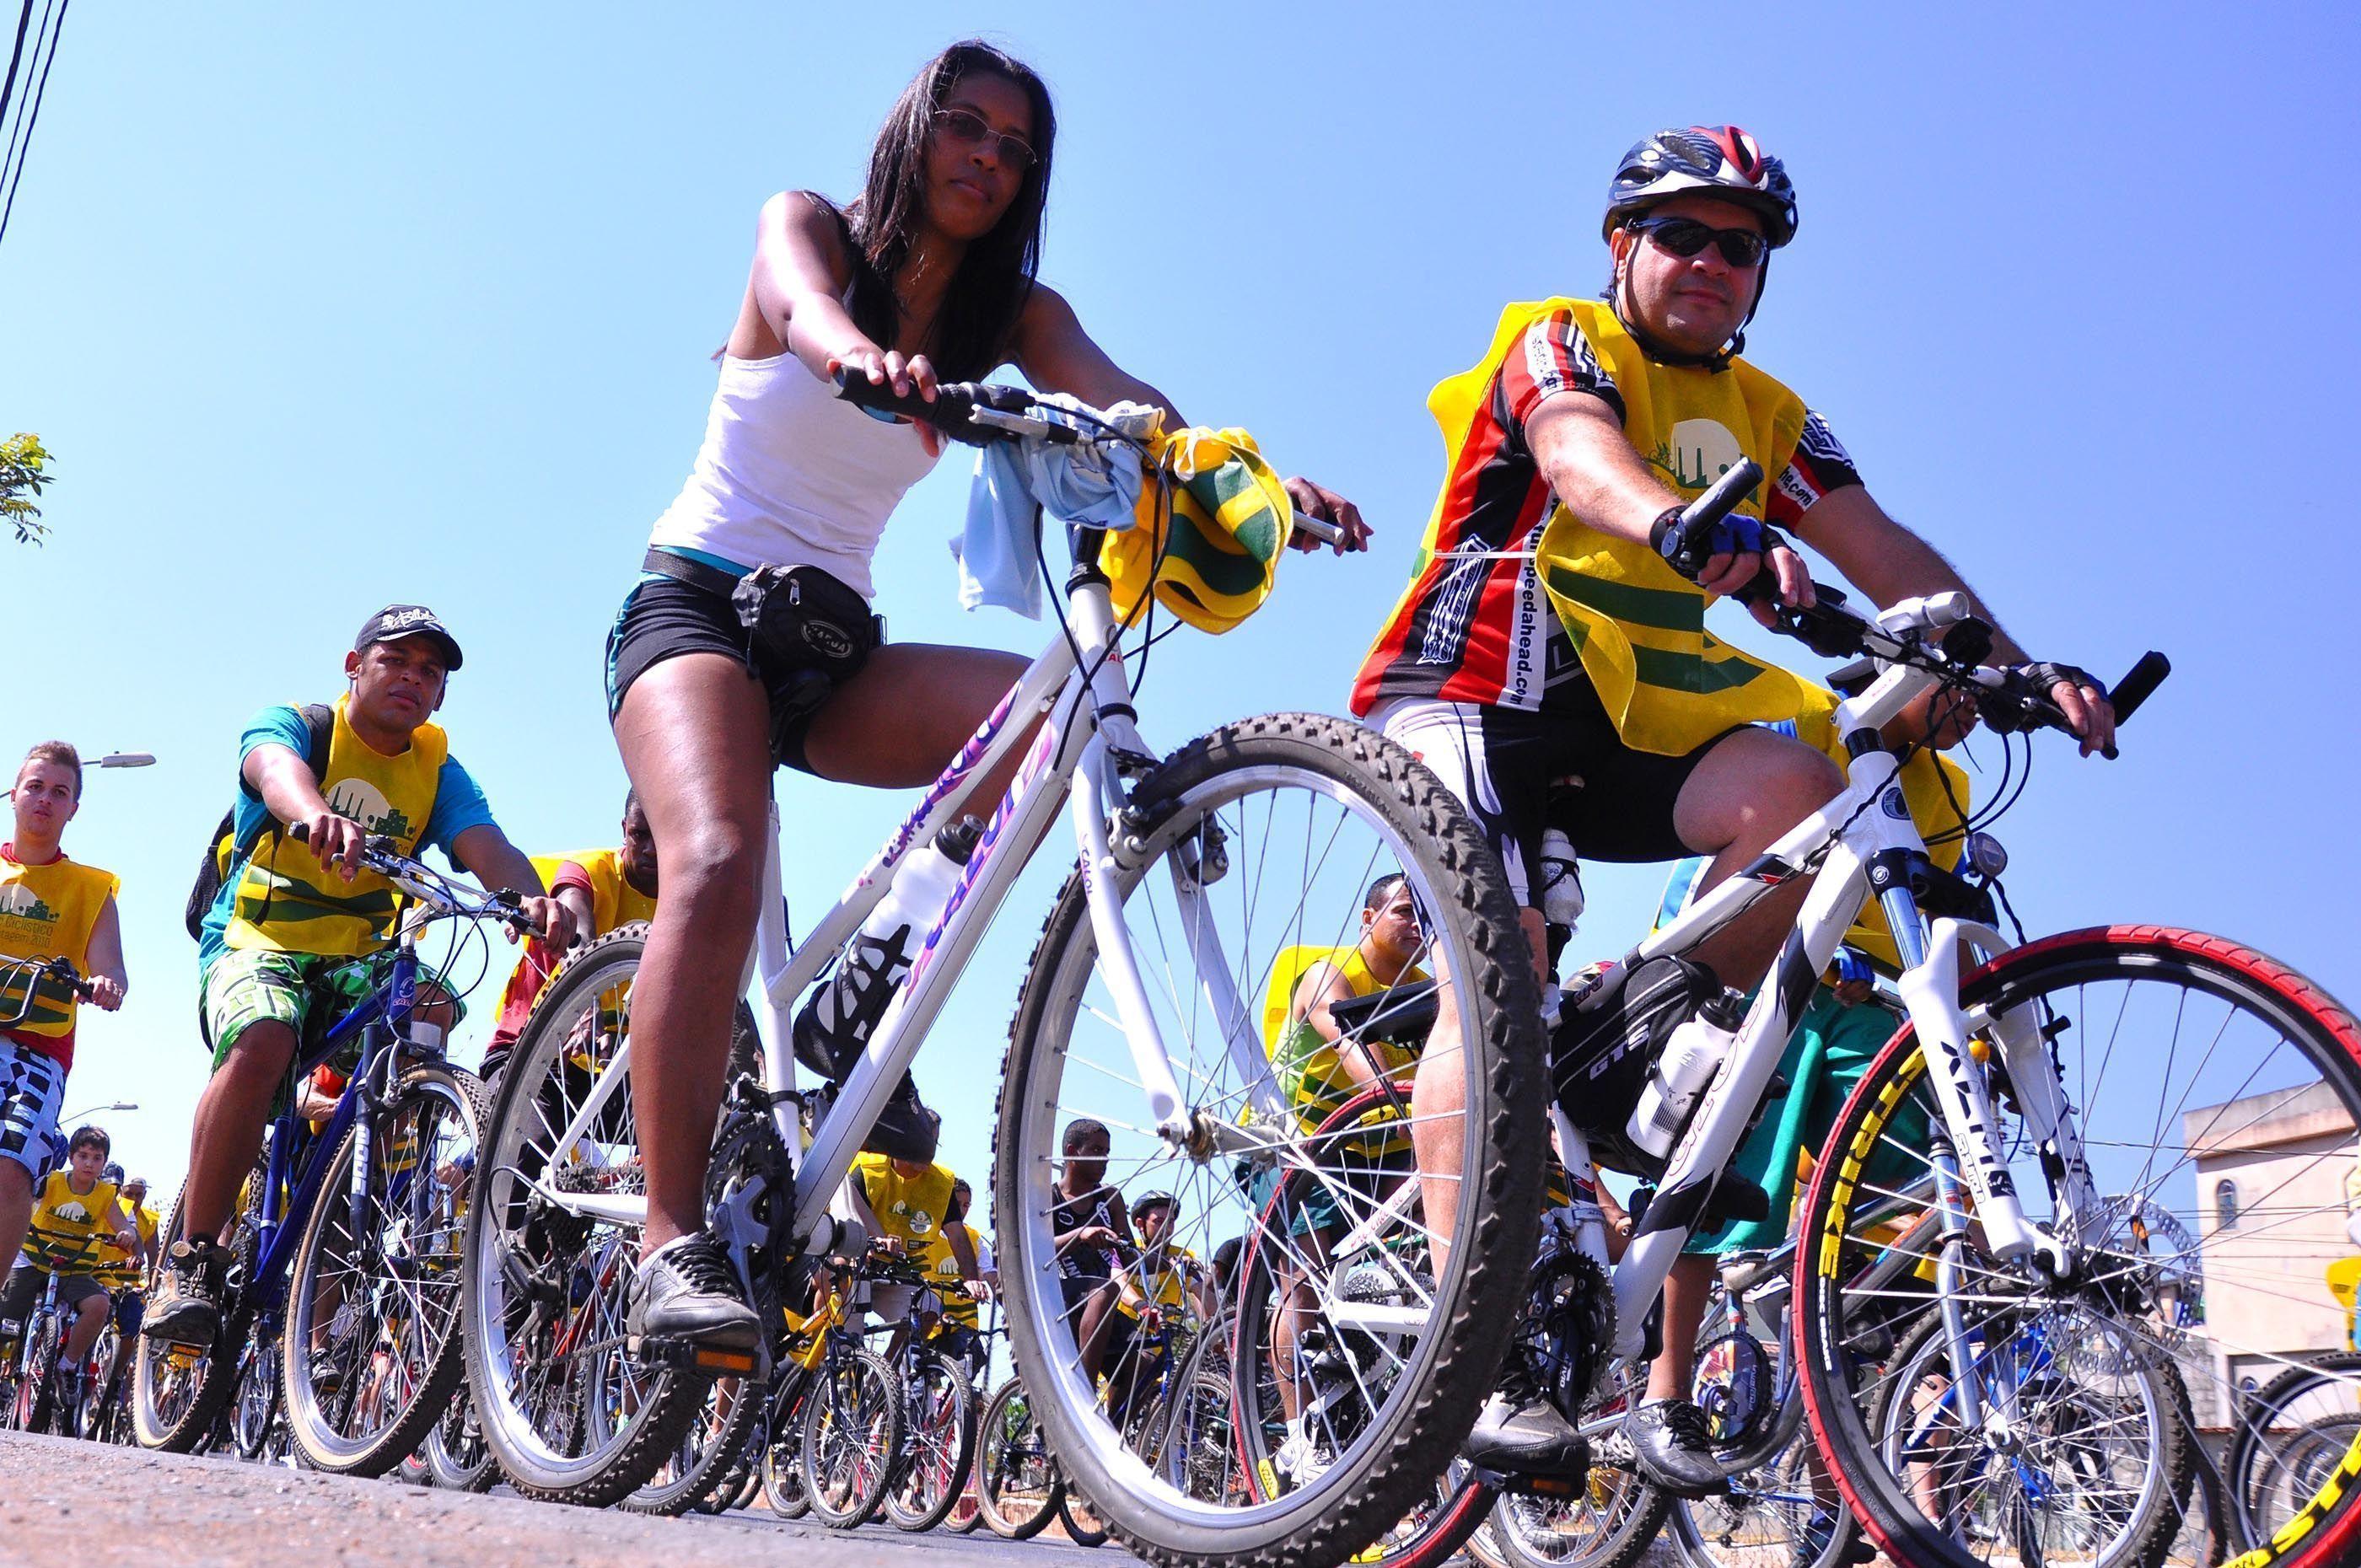 Igreja realiza passeio ciclístico neste sábado (8) em Belo Jardim